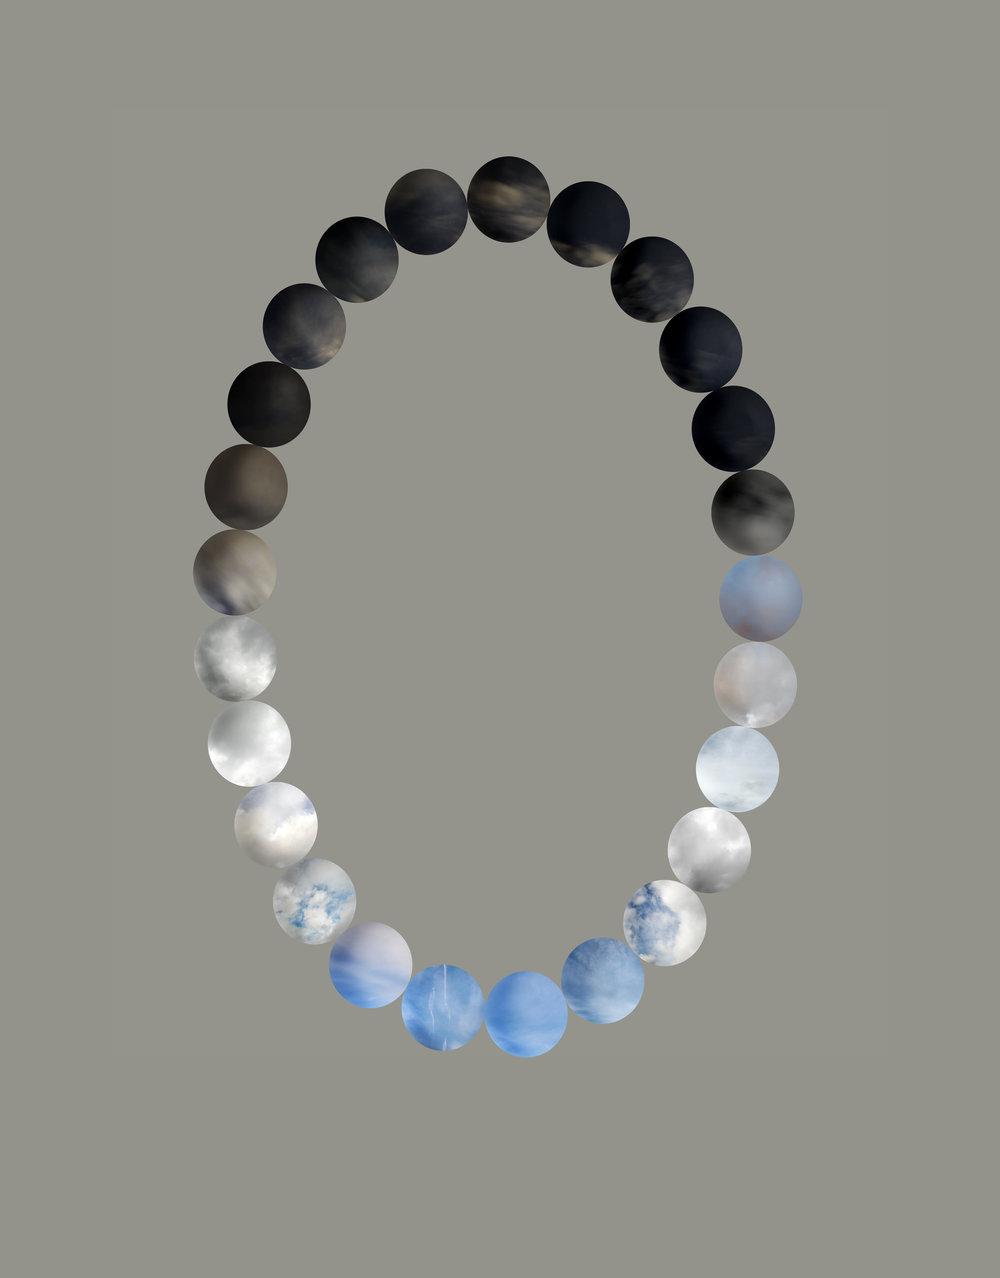 Sky Pearls: Hourly, October 18, Seattle, 2009  Digital mock-up